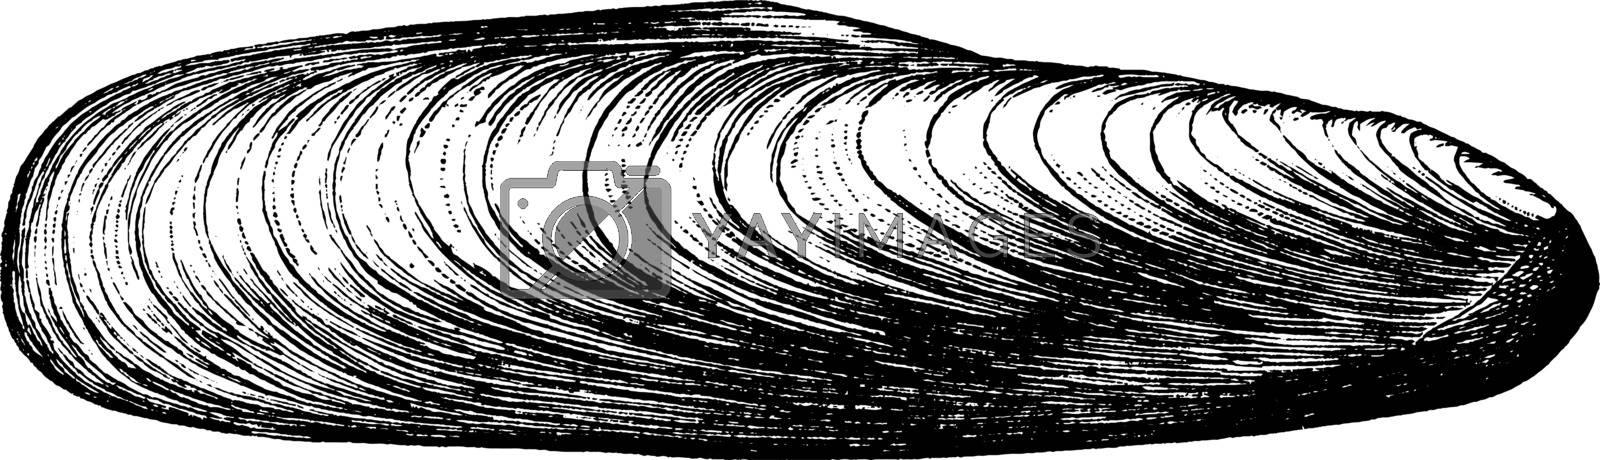 Date Shell, vintage illustration. by Morphart